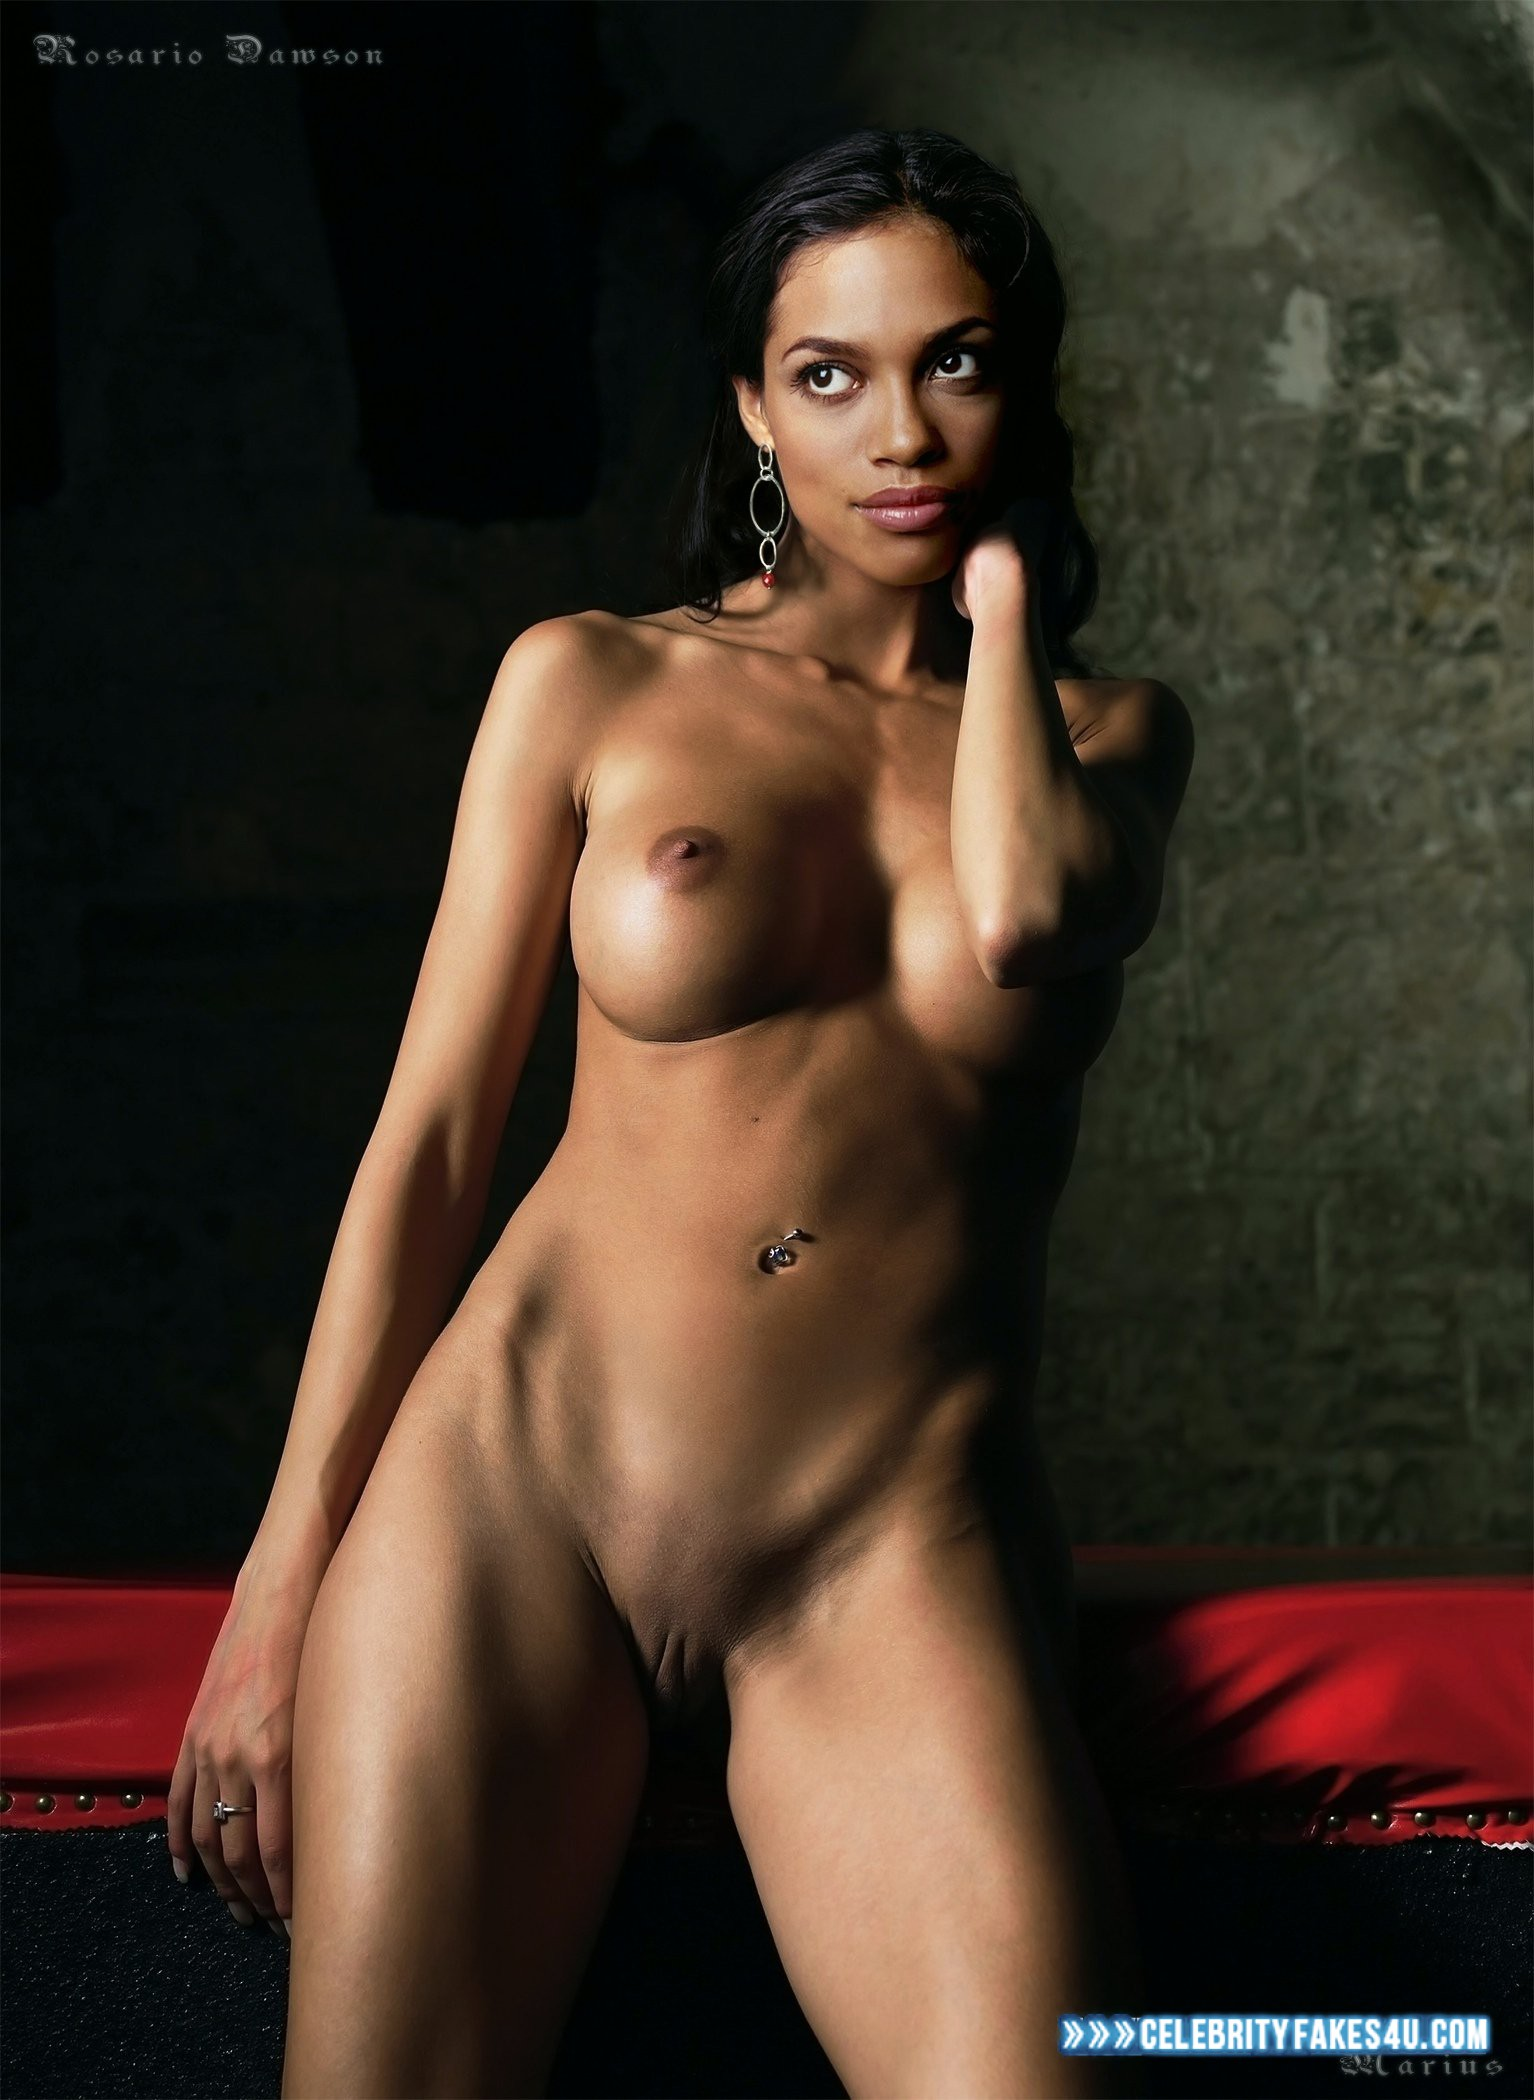 Rosario Dawson Nude Body Nice Tits 001  Celebrityfakes4Ucom-7859